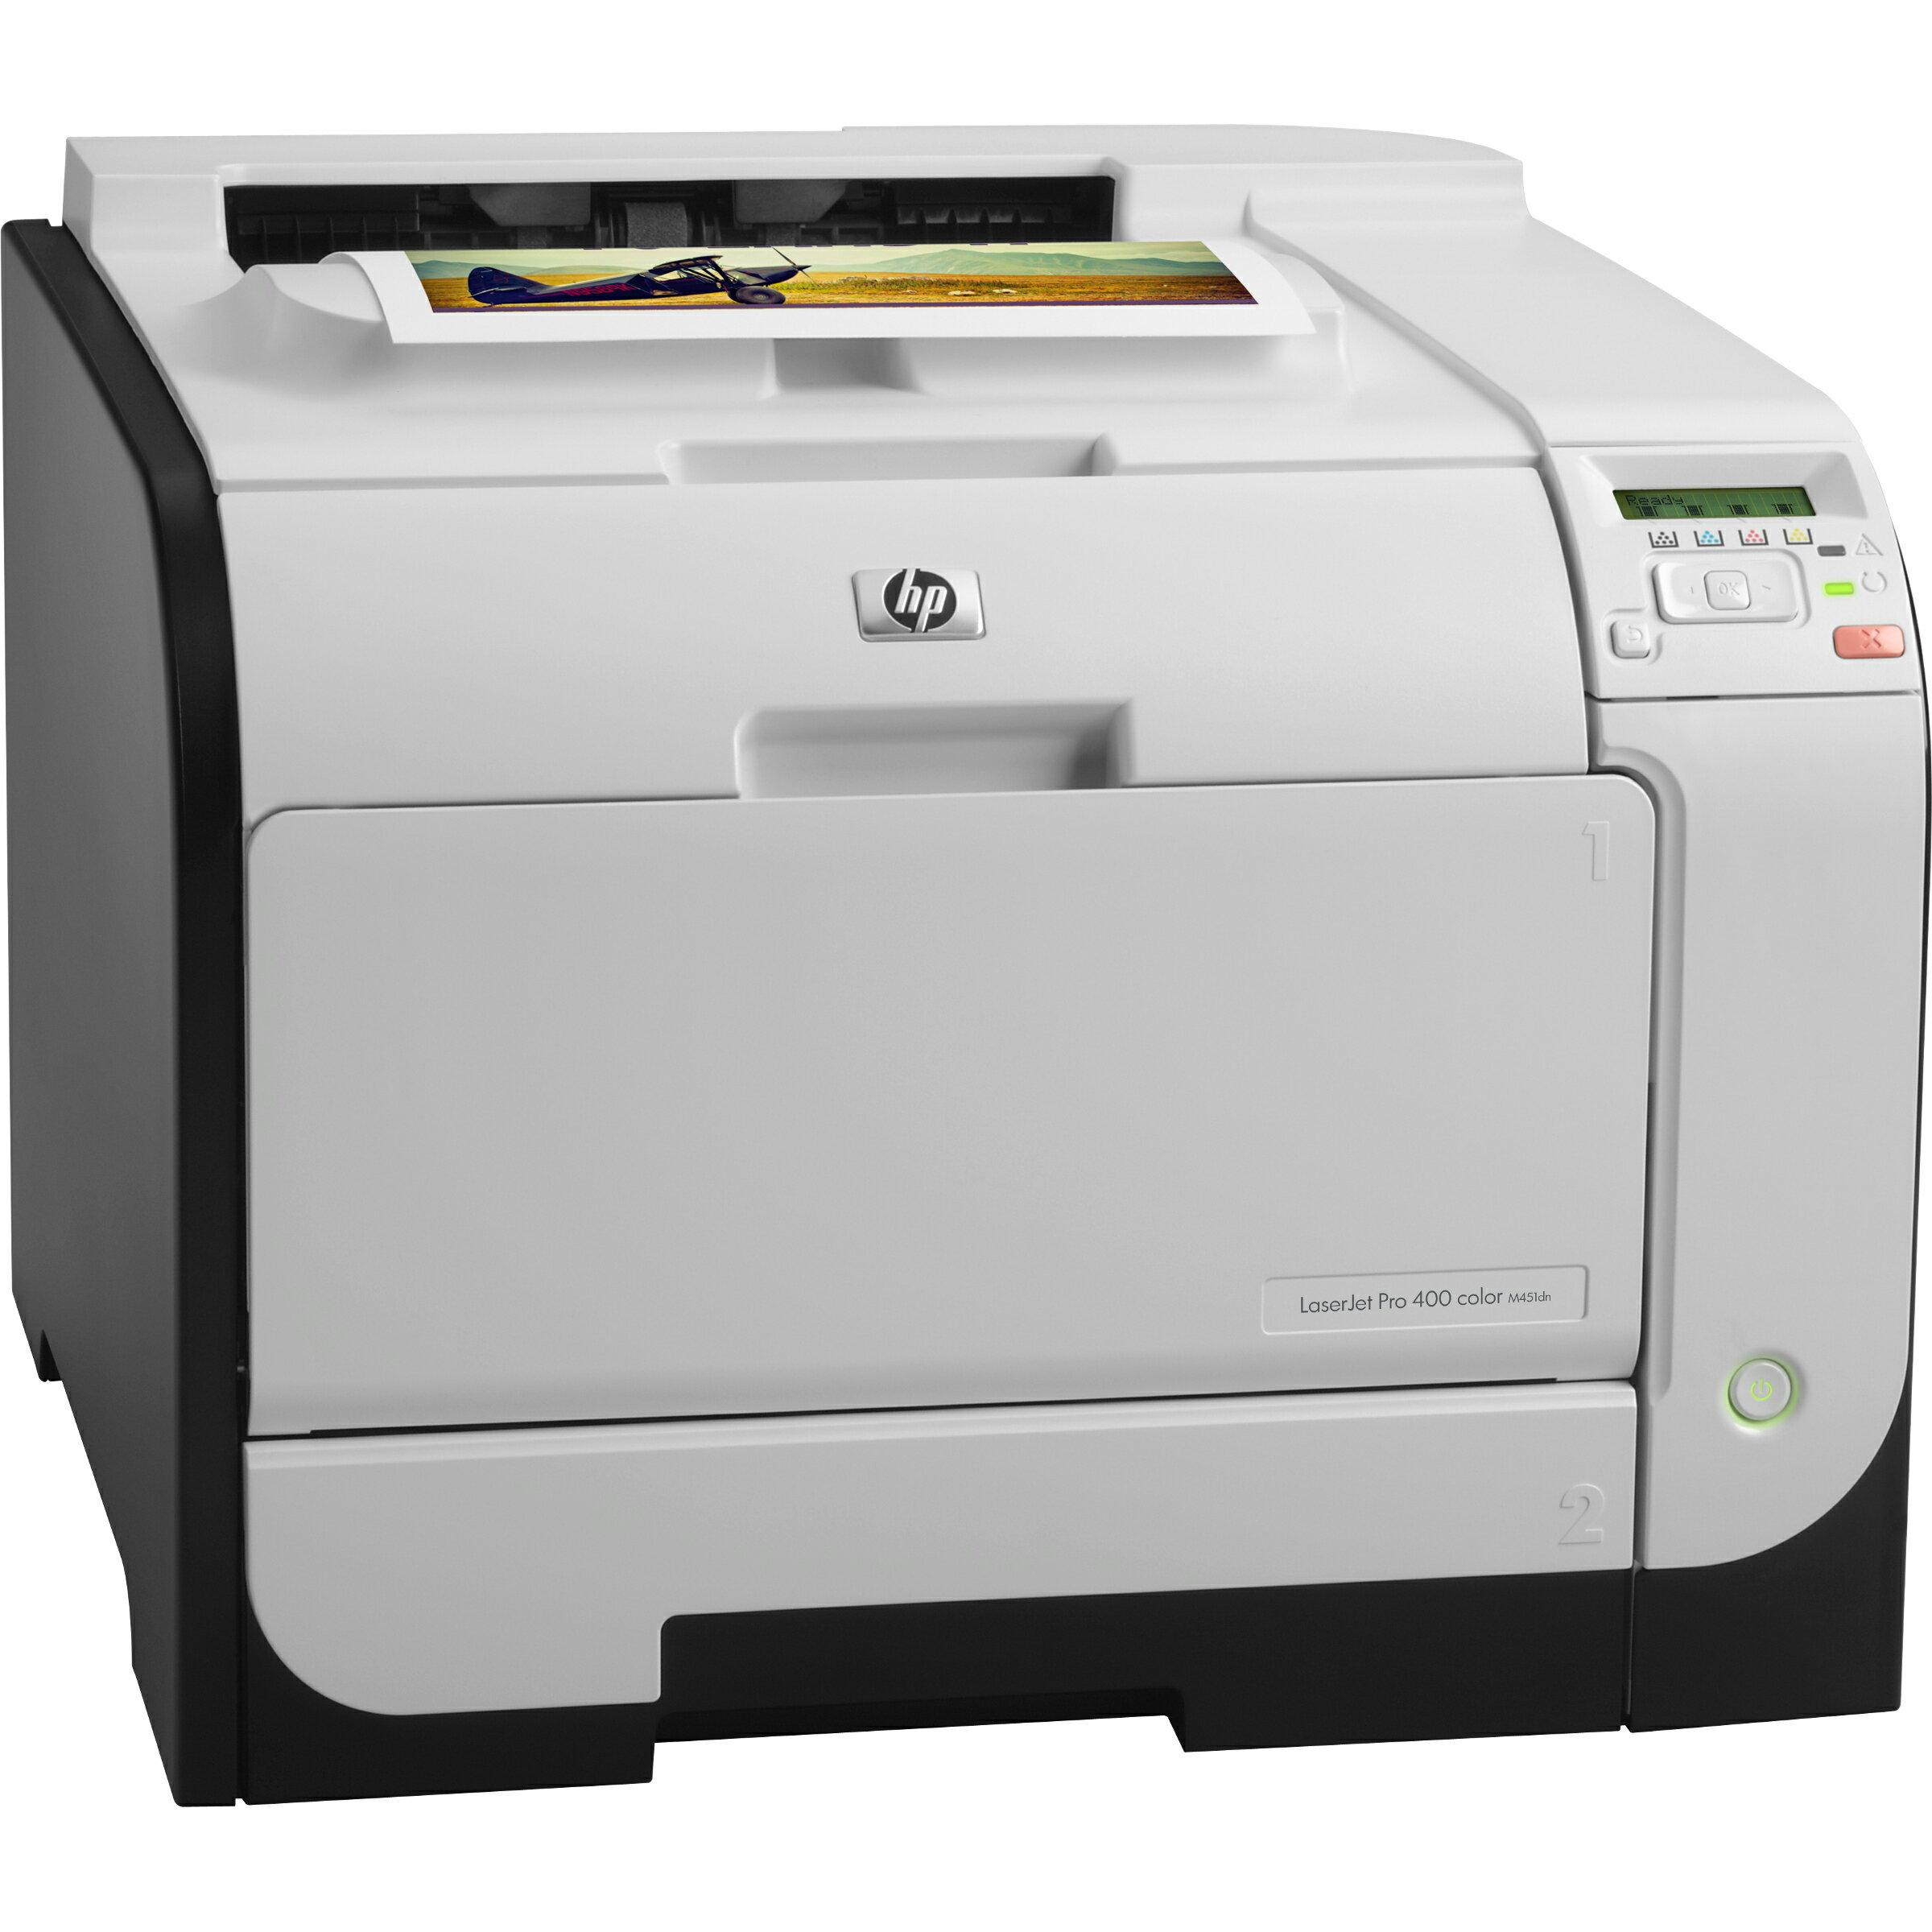 HP LaserJet Pro 400 M451DN Laser Printer - Refurbished - Color - 600 x 600 dpi Print - Plain Paper Print - Desktop - 21 ppm Mono / 21 ppm Color Print - 300 sheets Standard Input Capacity - 40000 pages per month - Automatic Duplex Print - LCD - Ethernet - 0